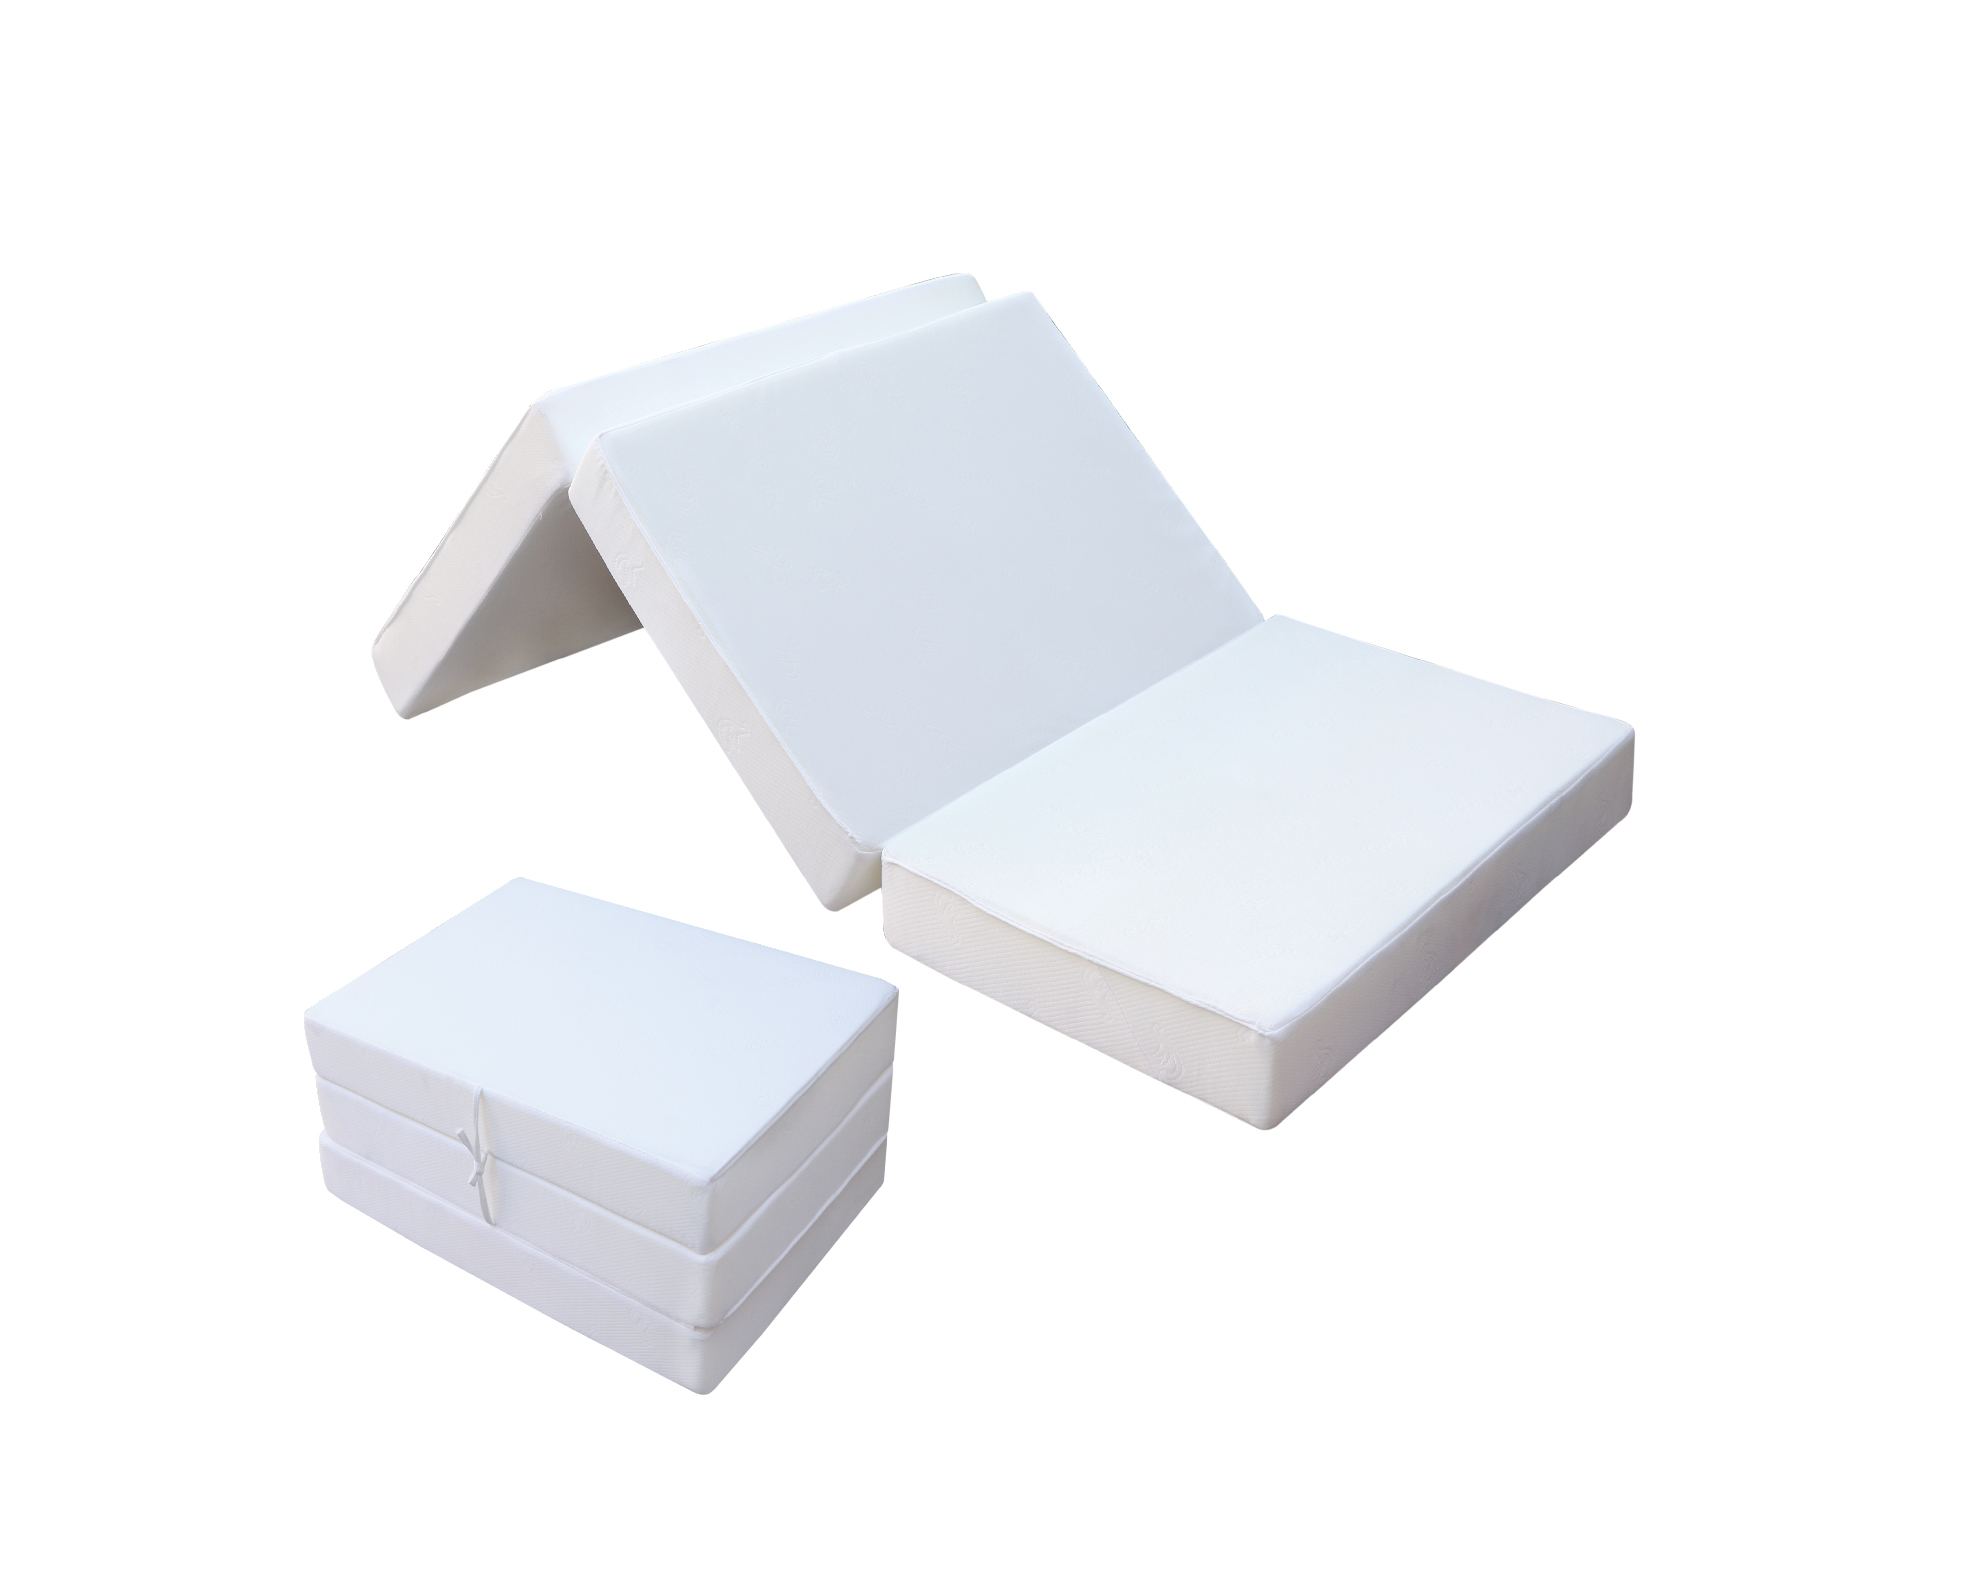 Deluxe High Quality Folding Mattress